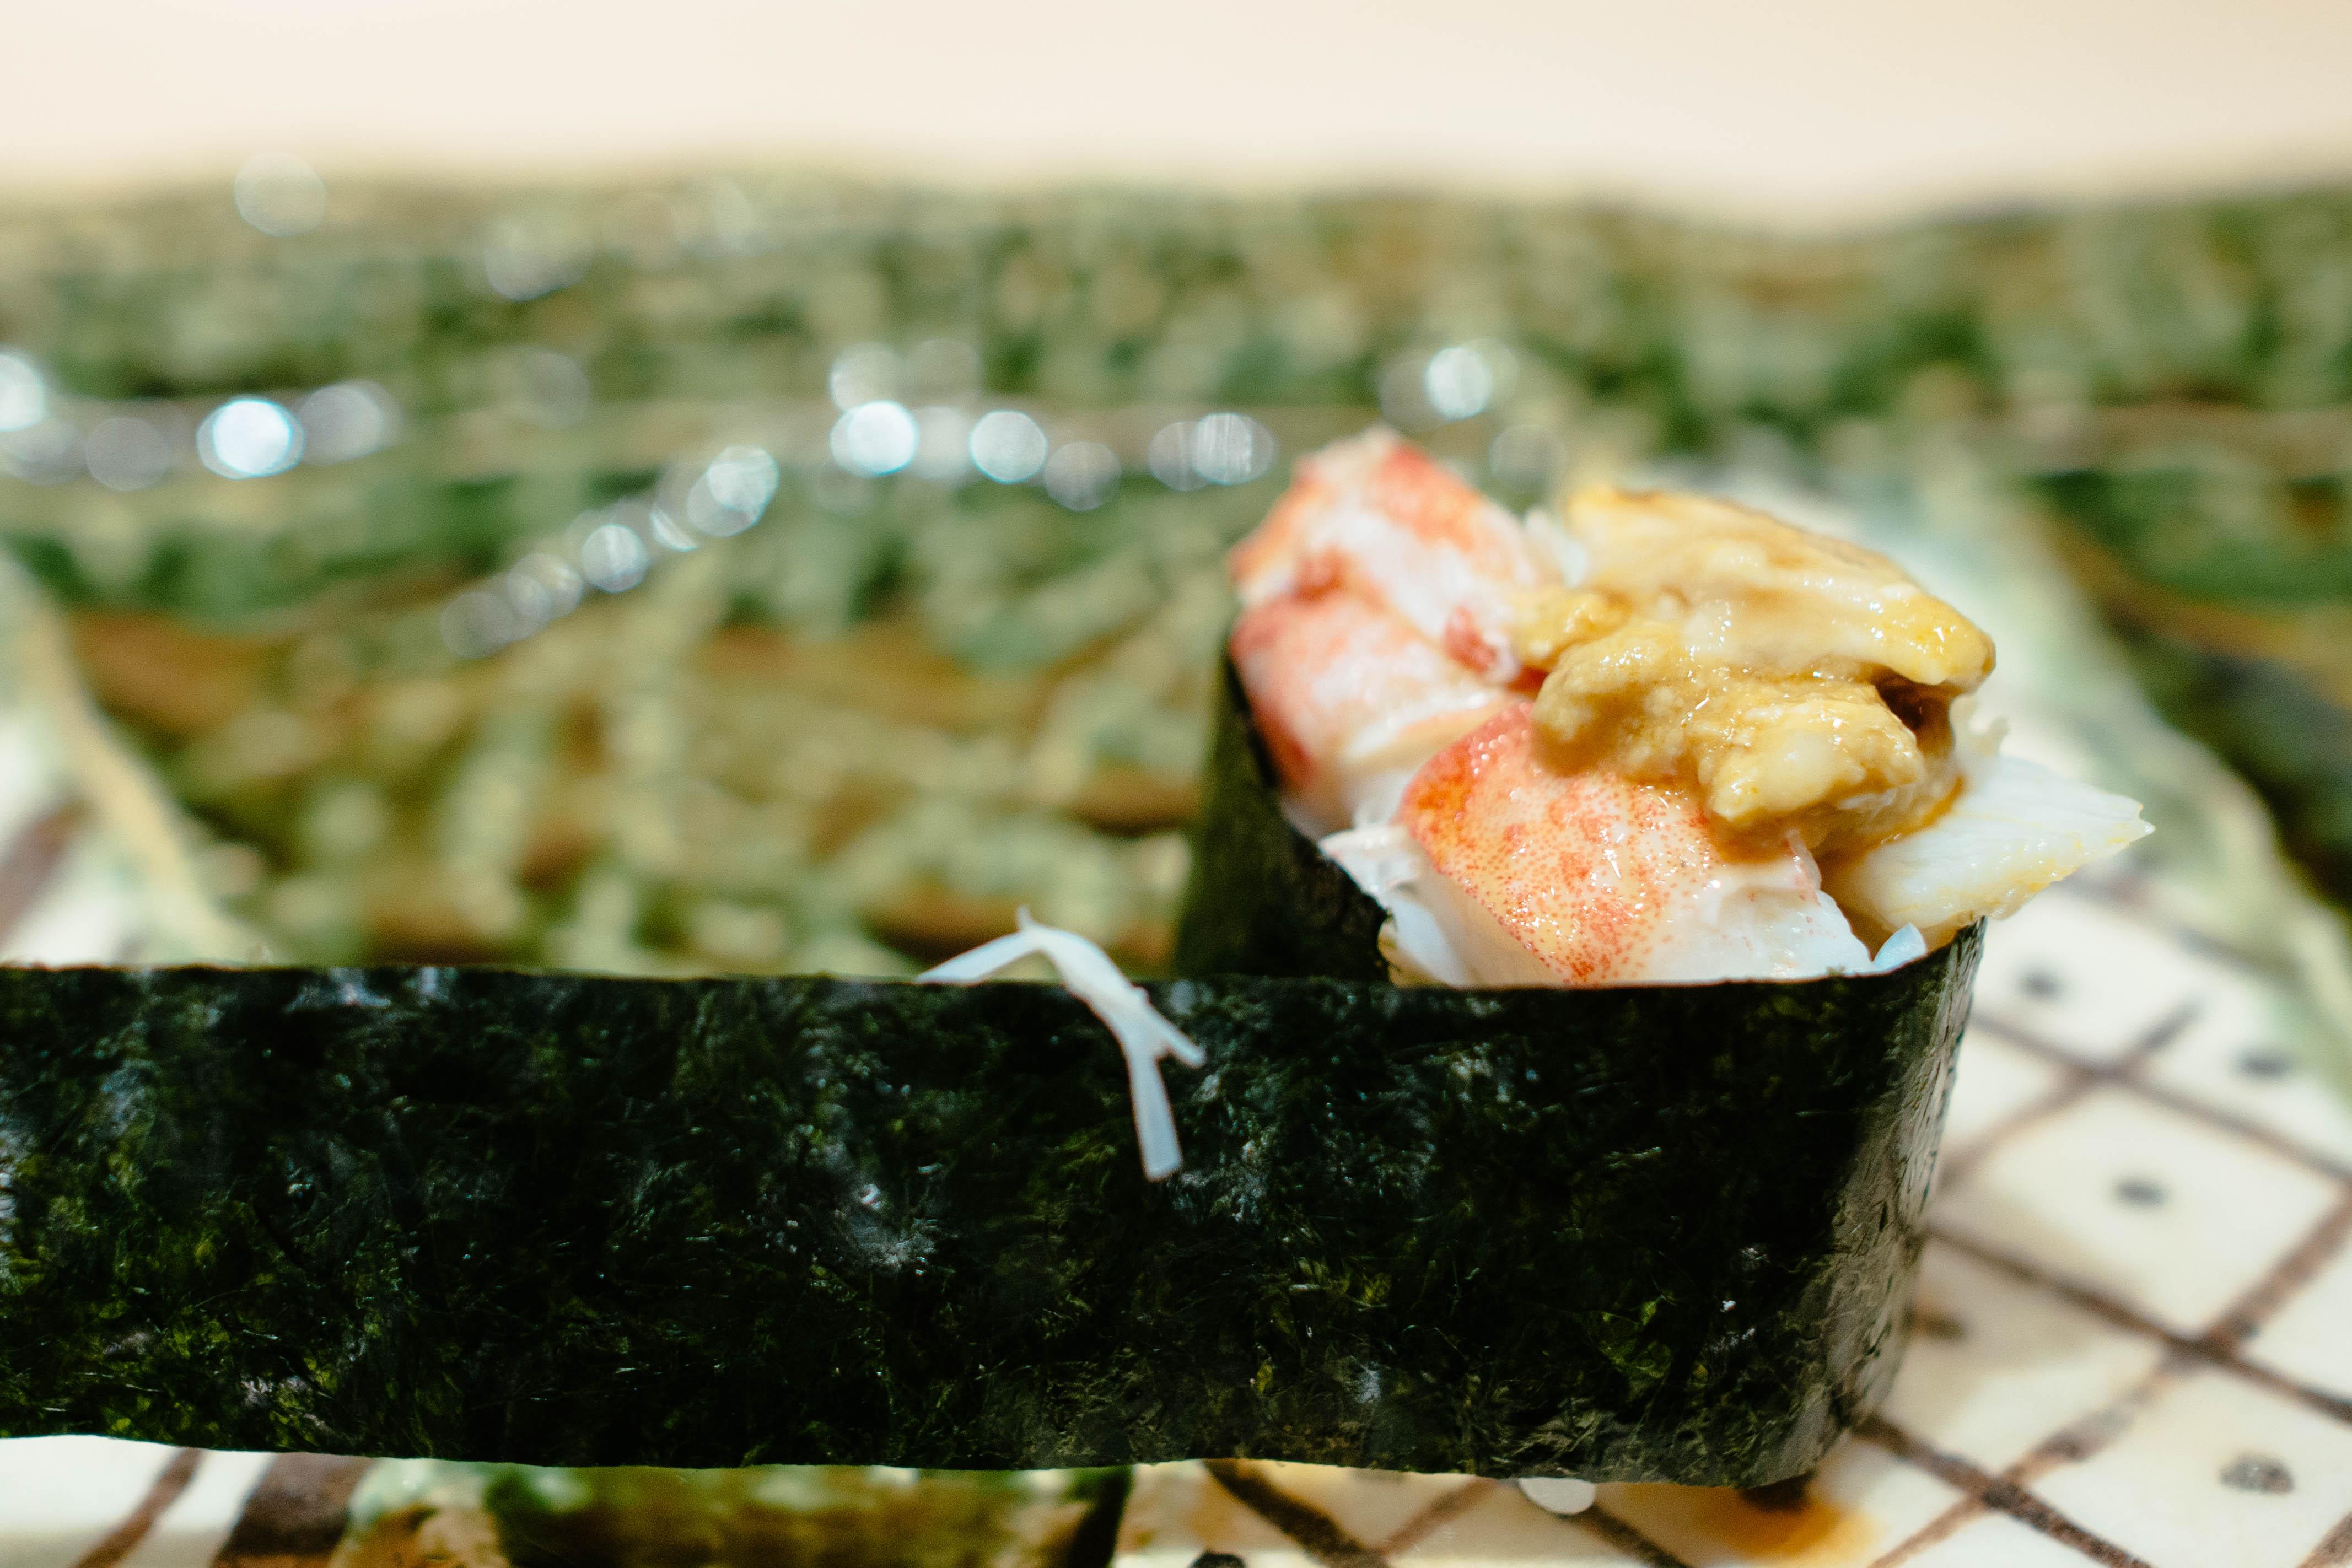 sushi-sase-hong-kong-best-sushi-restaurant-hong-kong-10